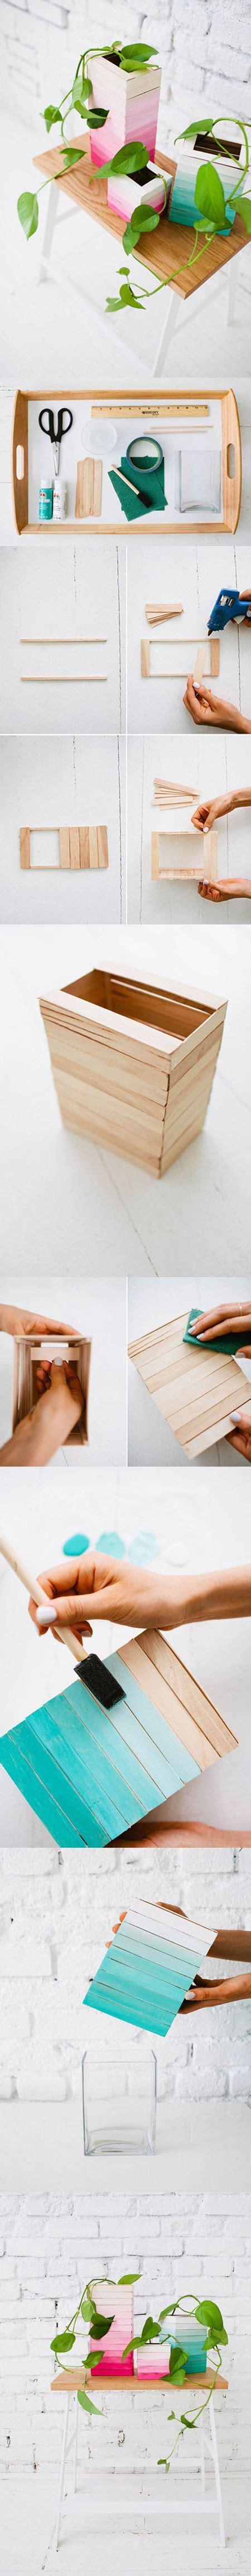 maceteros de madera para interior macetas para interior planta artificial para interiores